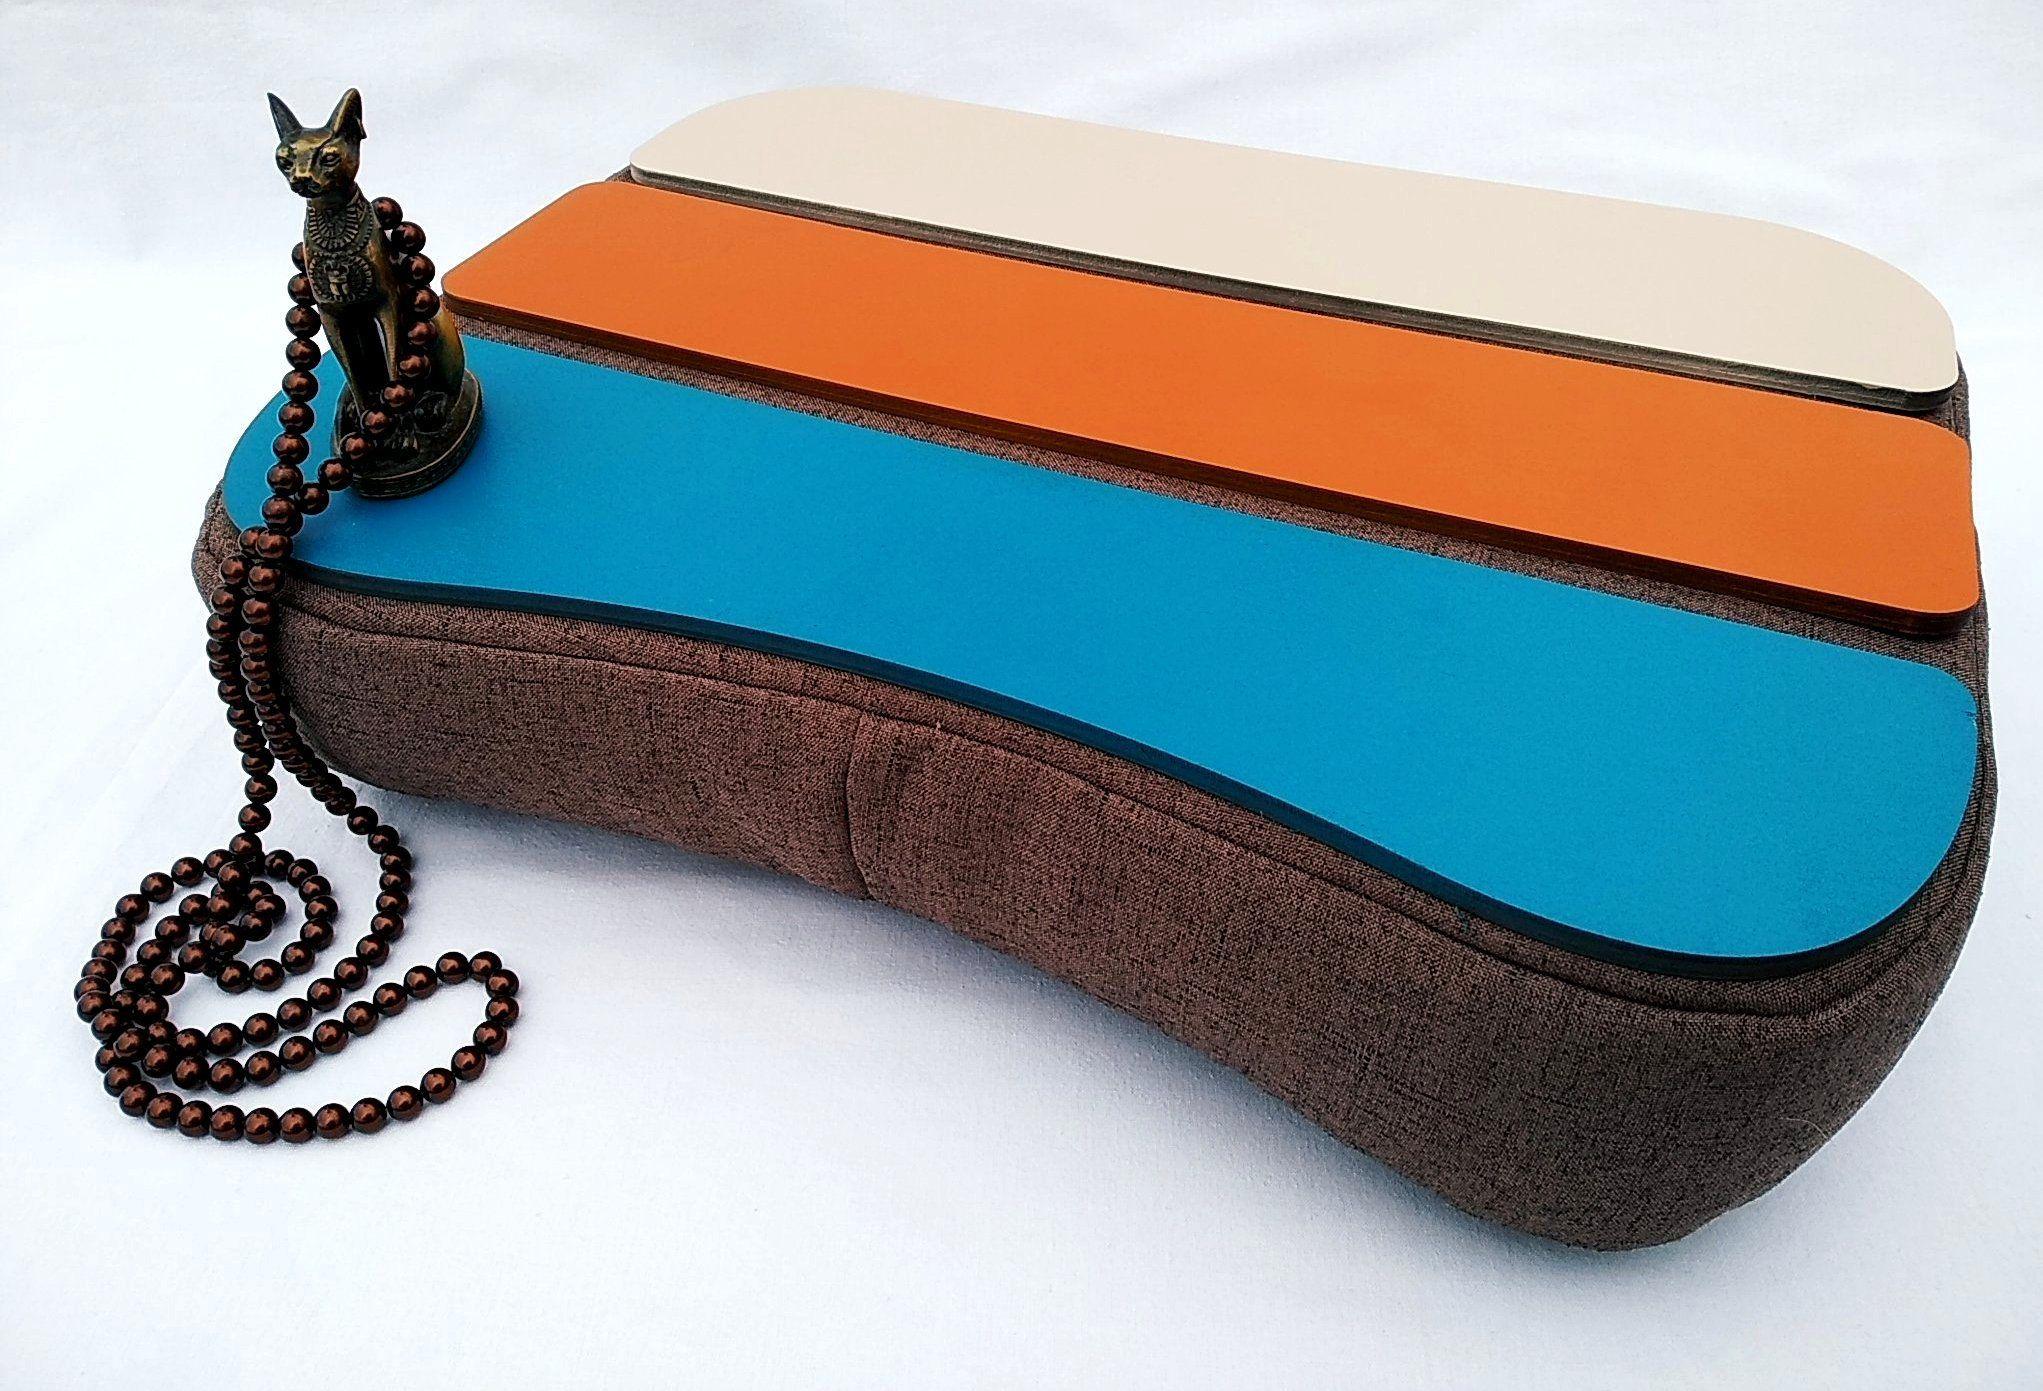 Lap Desk With Pillow Laptop Tray Bean Bag Laptop Trays In 2020 With Images Laptop Tray Lap Desk Bean Bag Laptop Tray